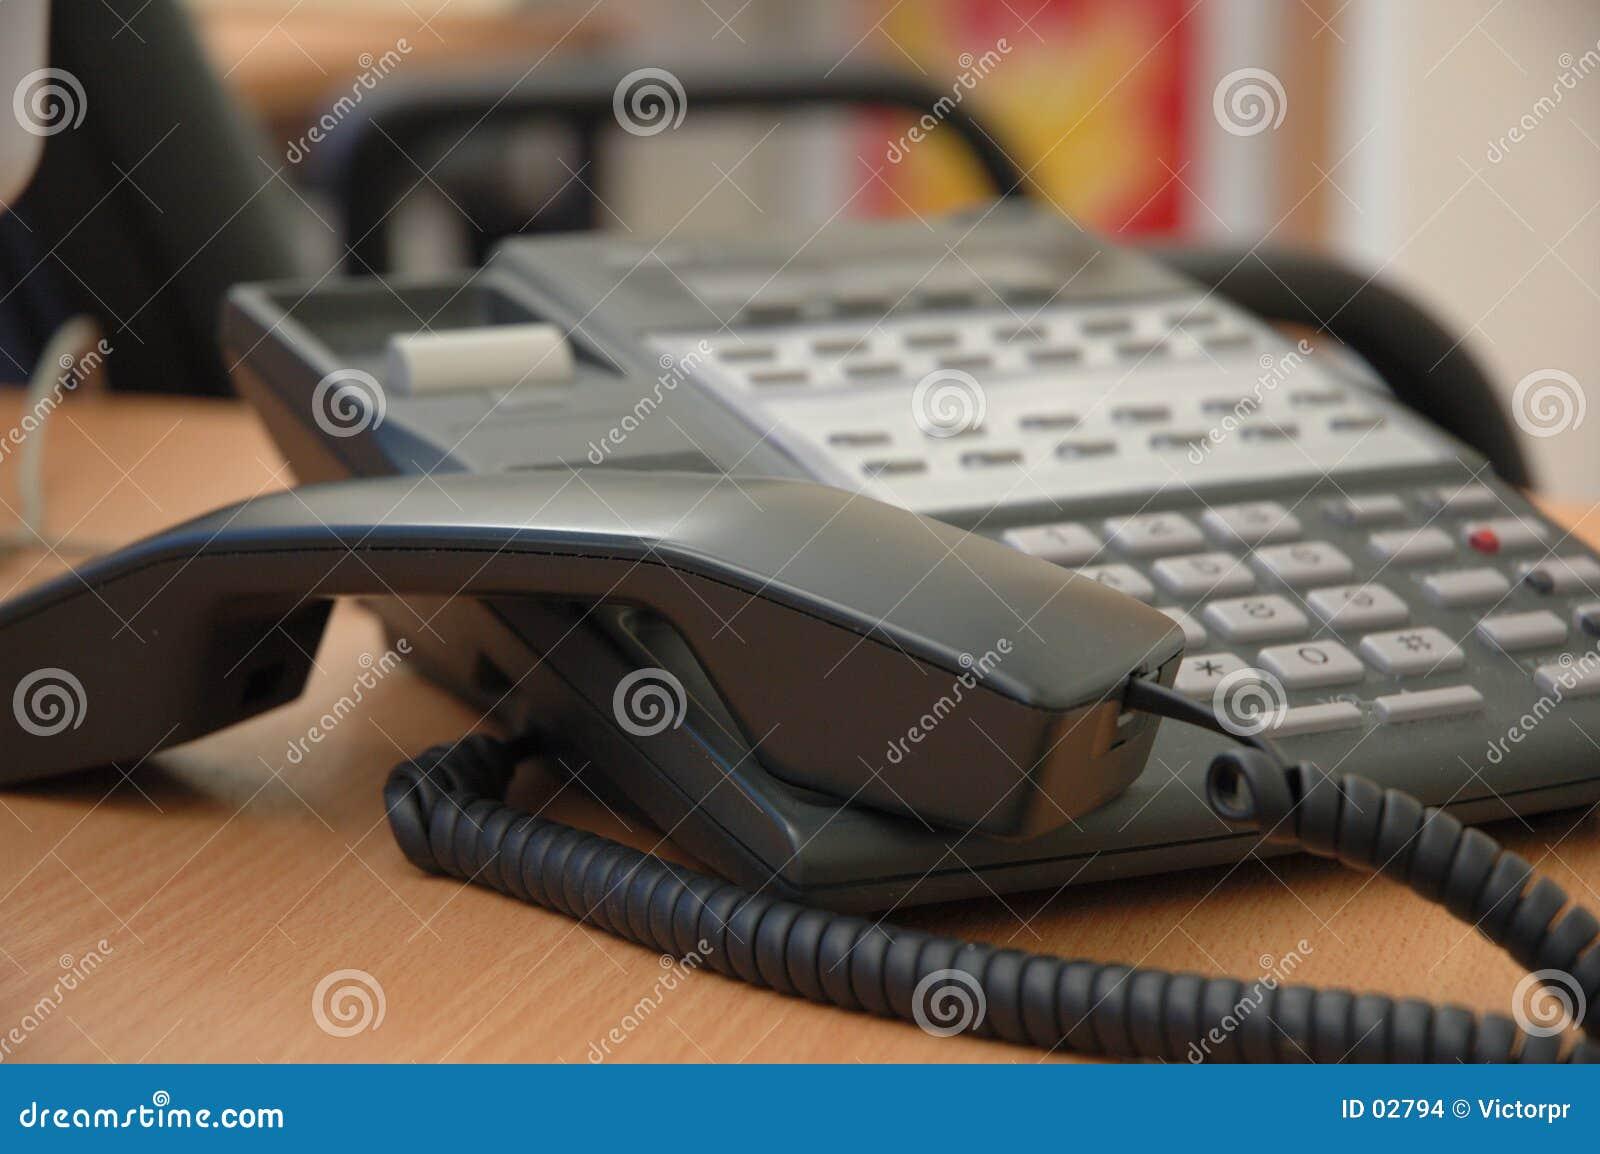 Busy phone